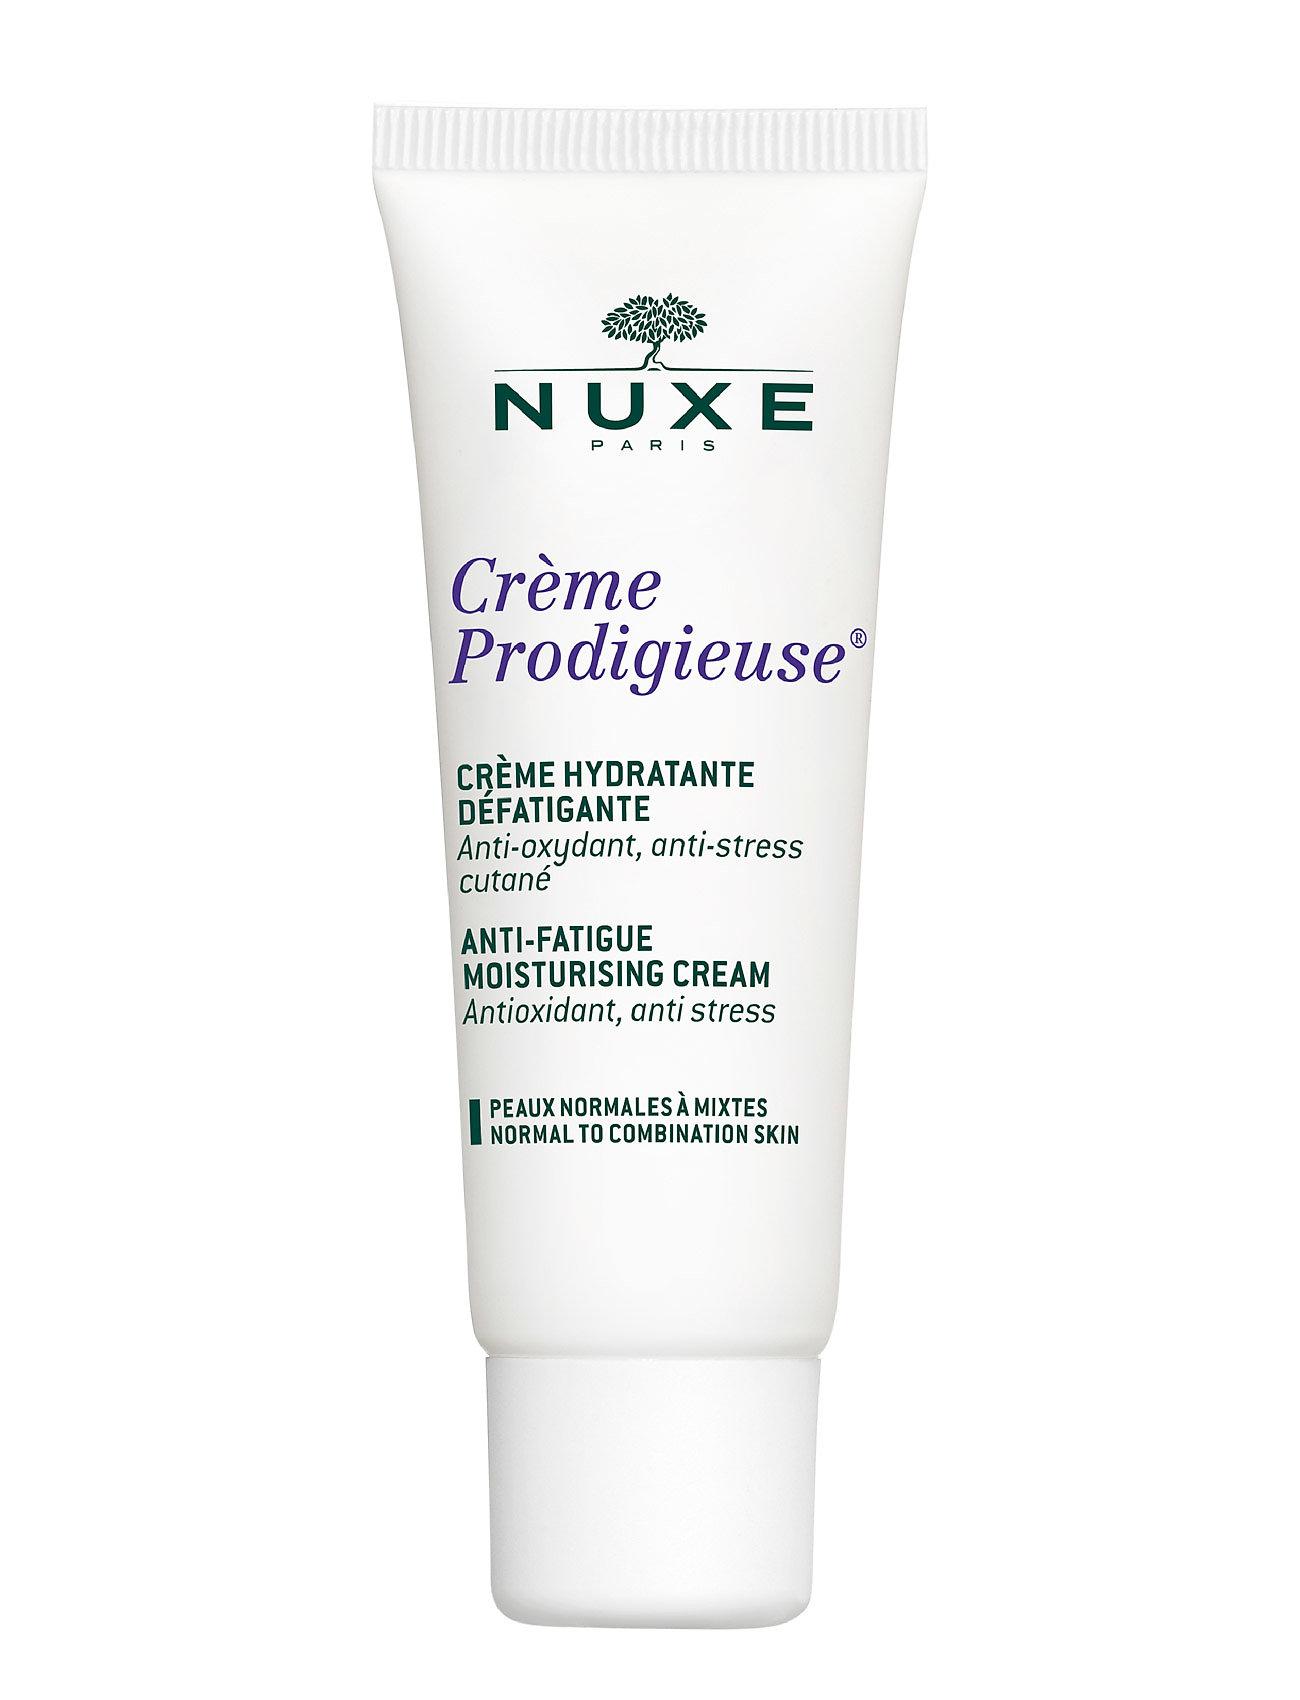 Creme prodigieuse antifatigue moisturizing cream fra nuxe på boozt.com dk